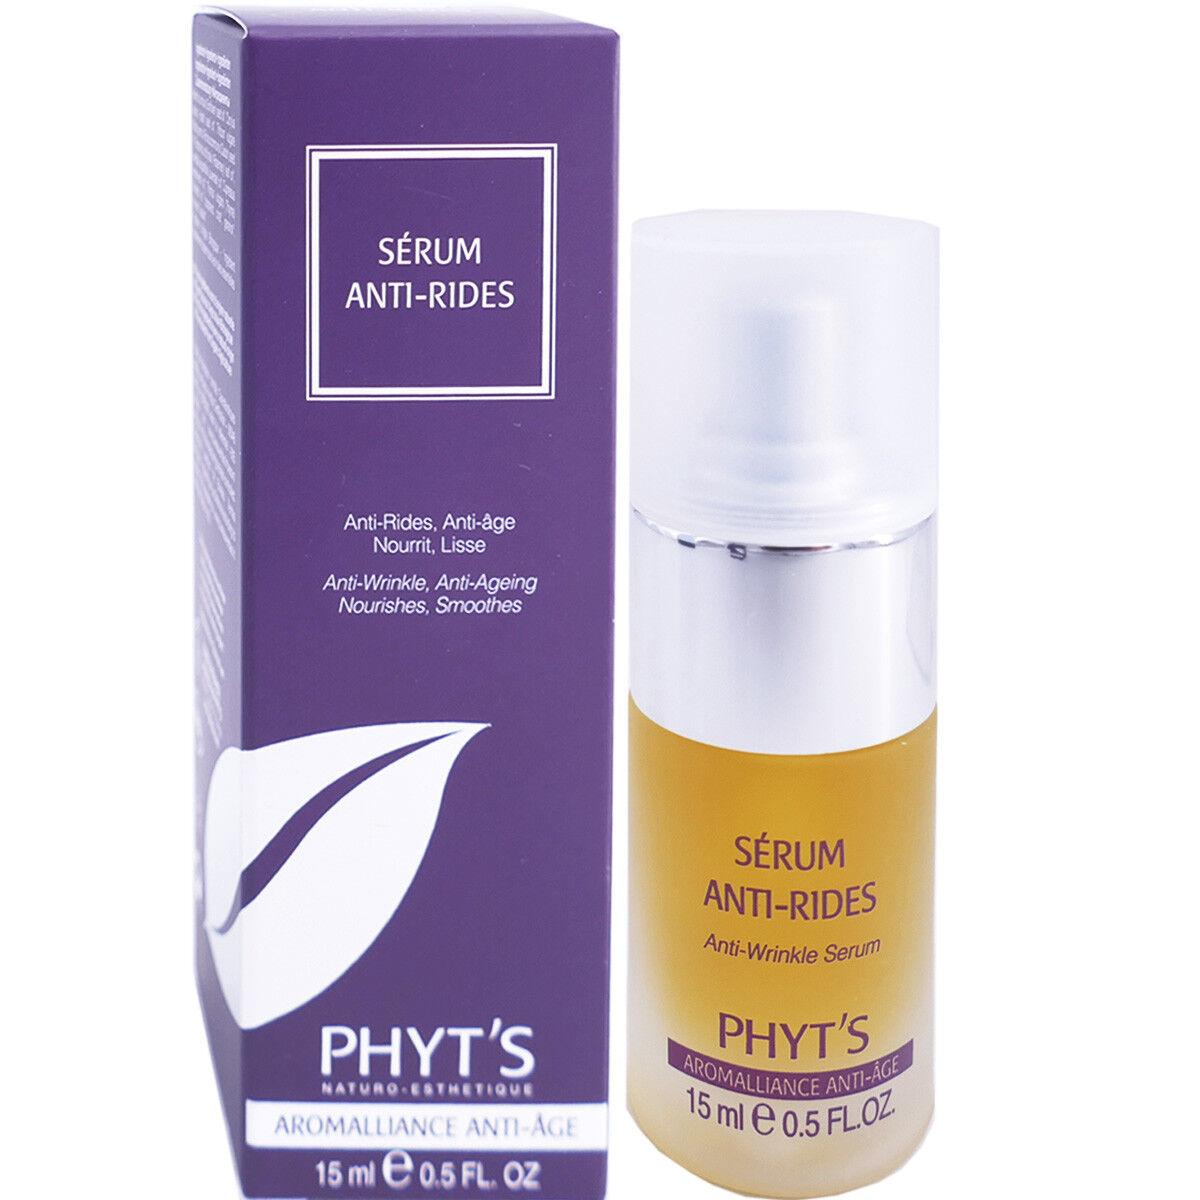 Phyt's aromalliance serum anti rides 16ml